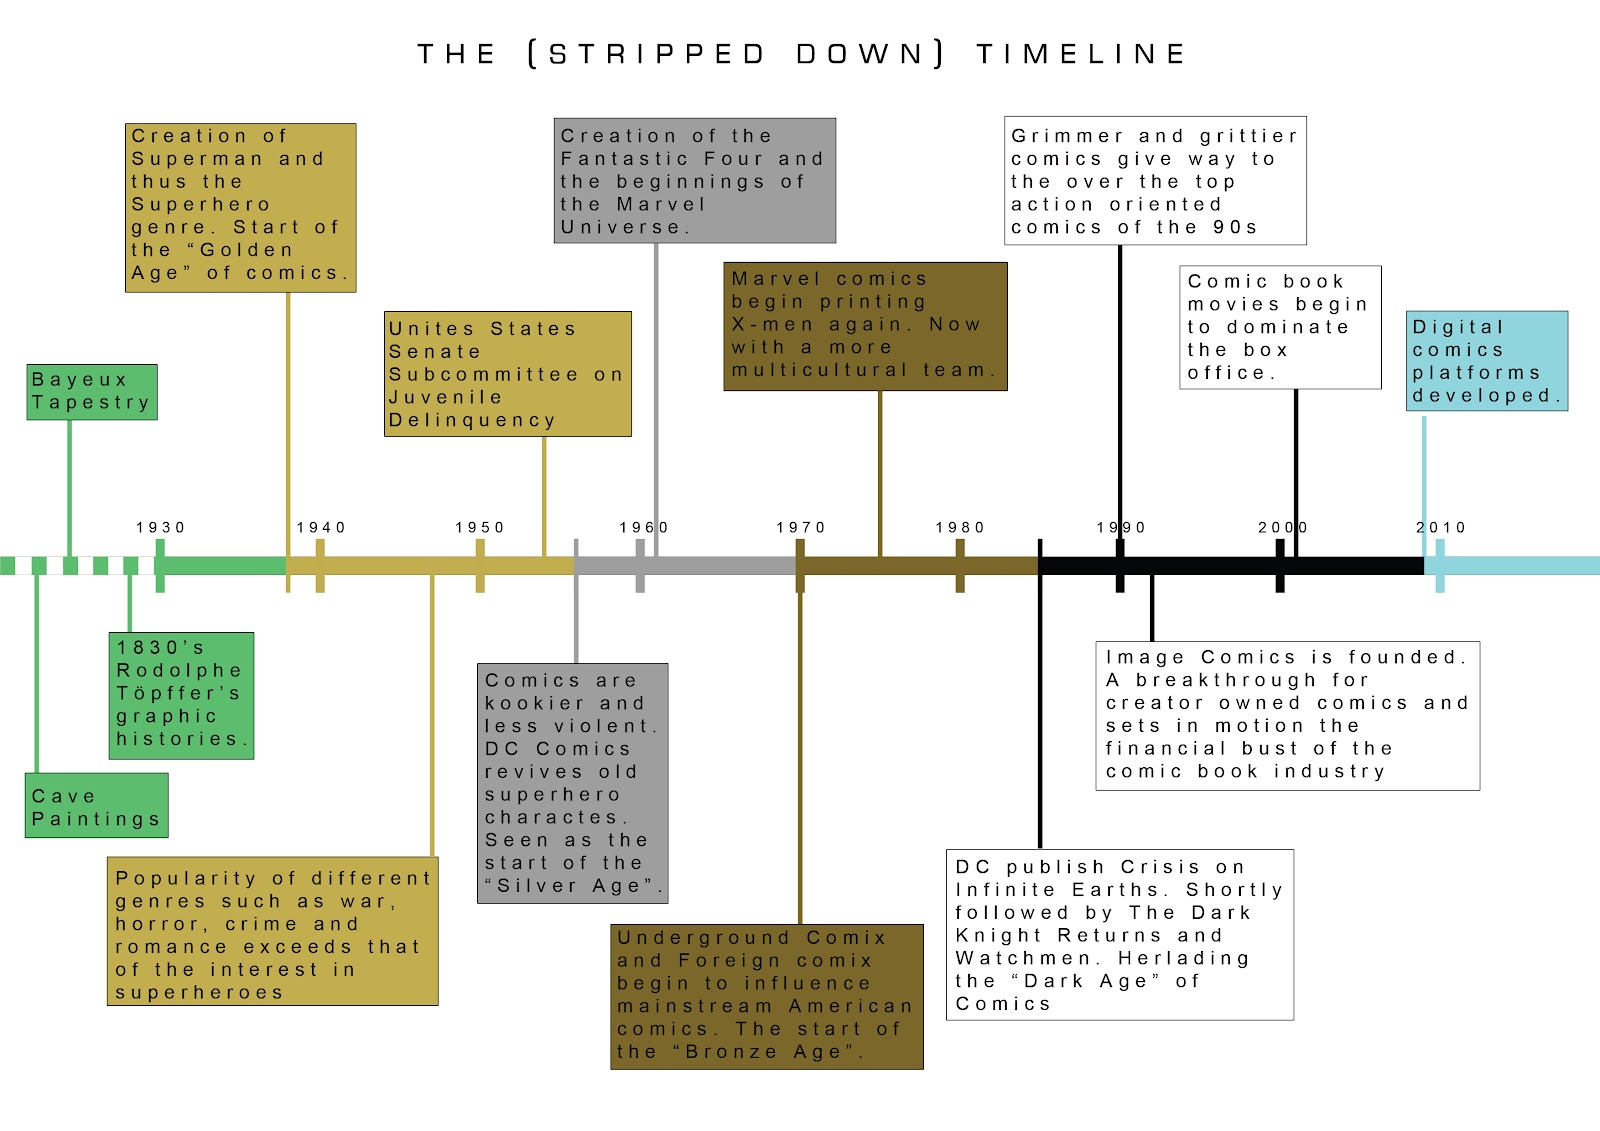 Timeline Template The timeline